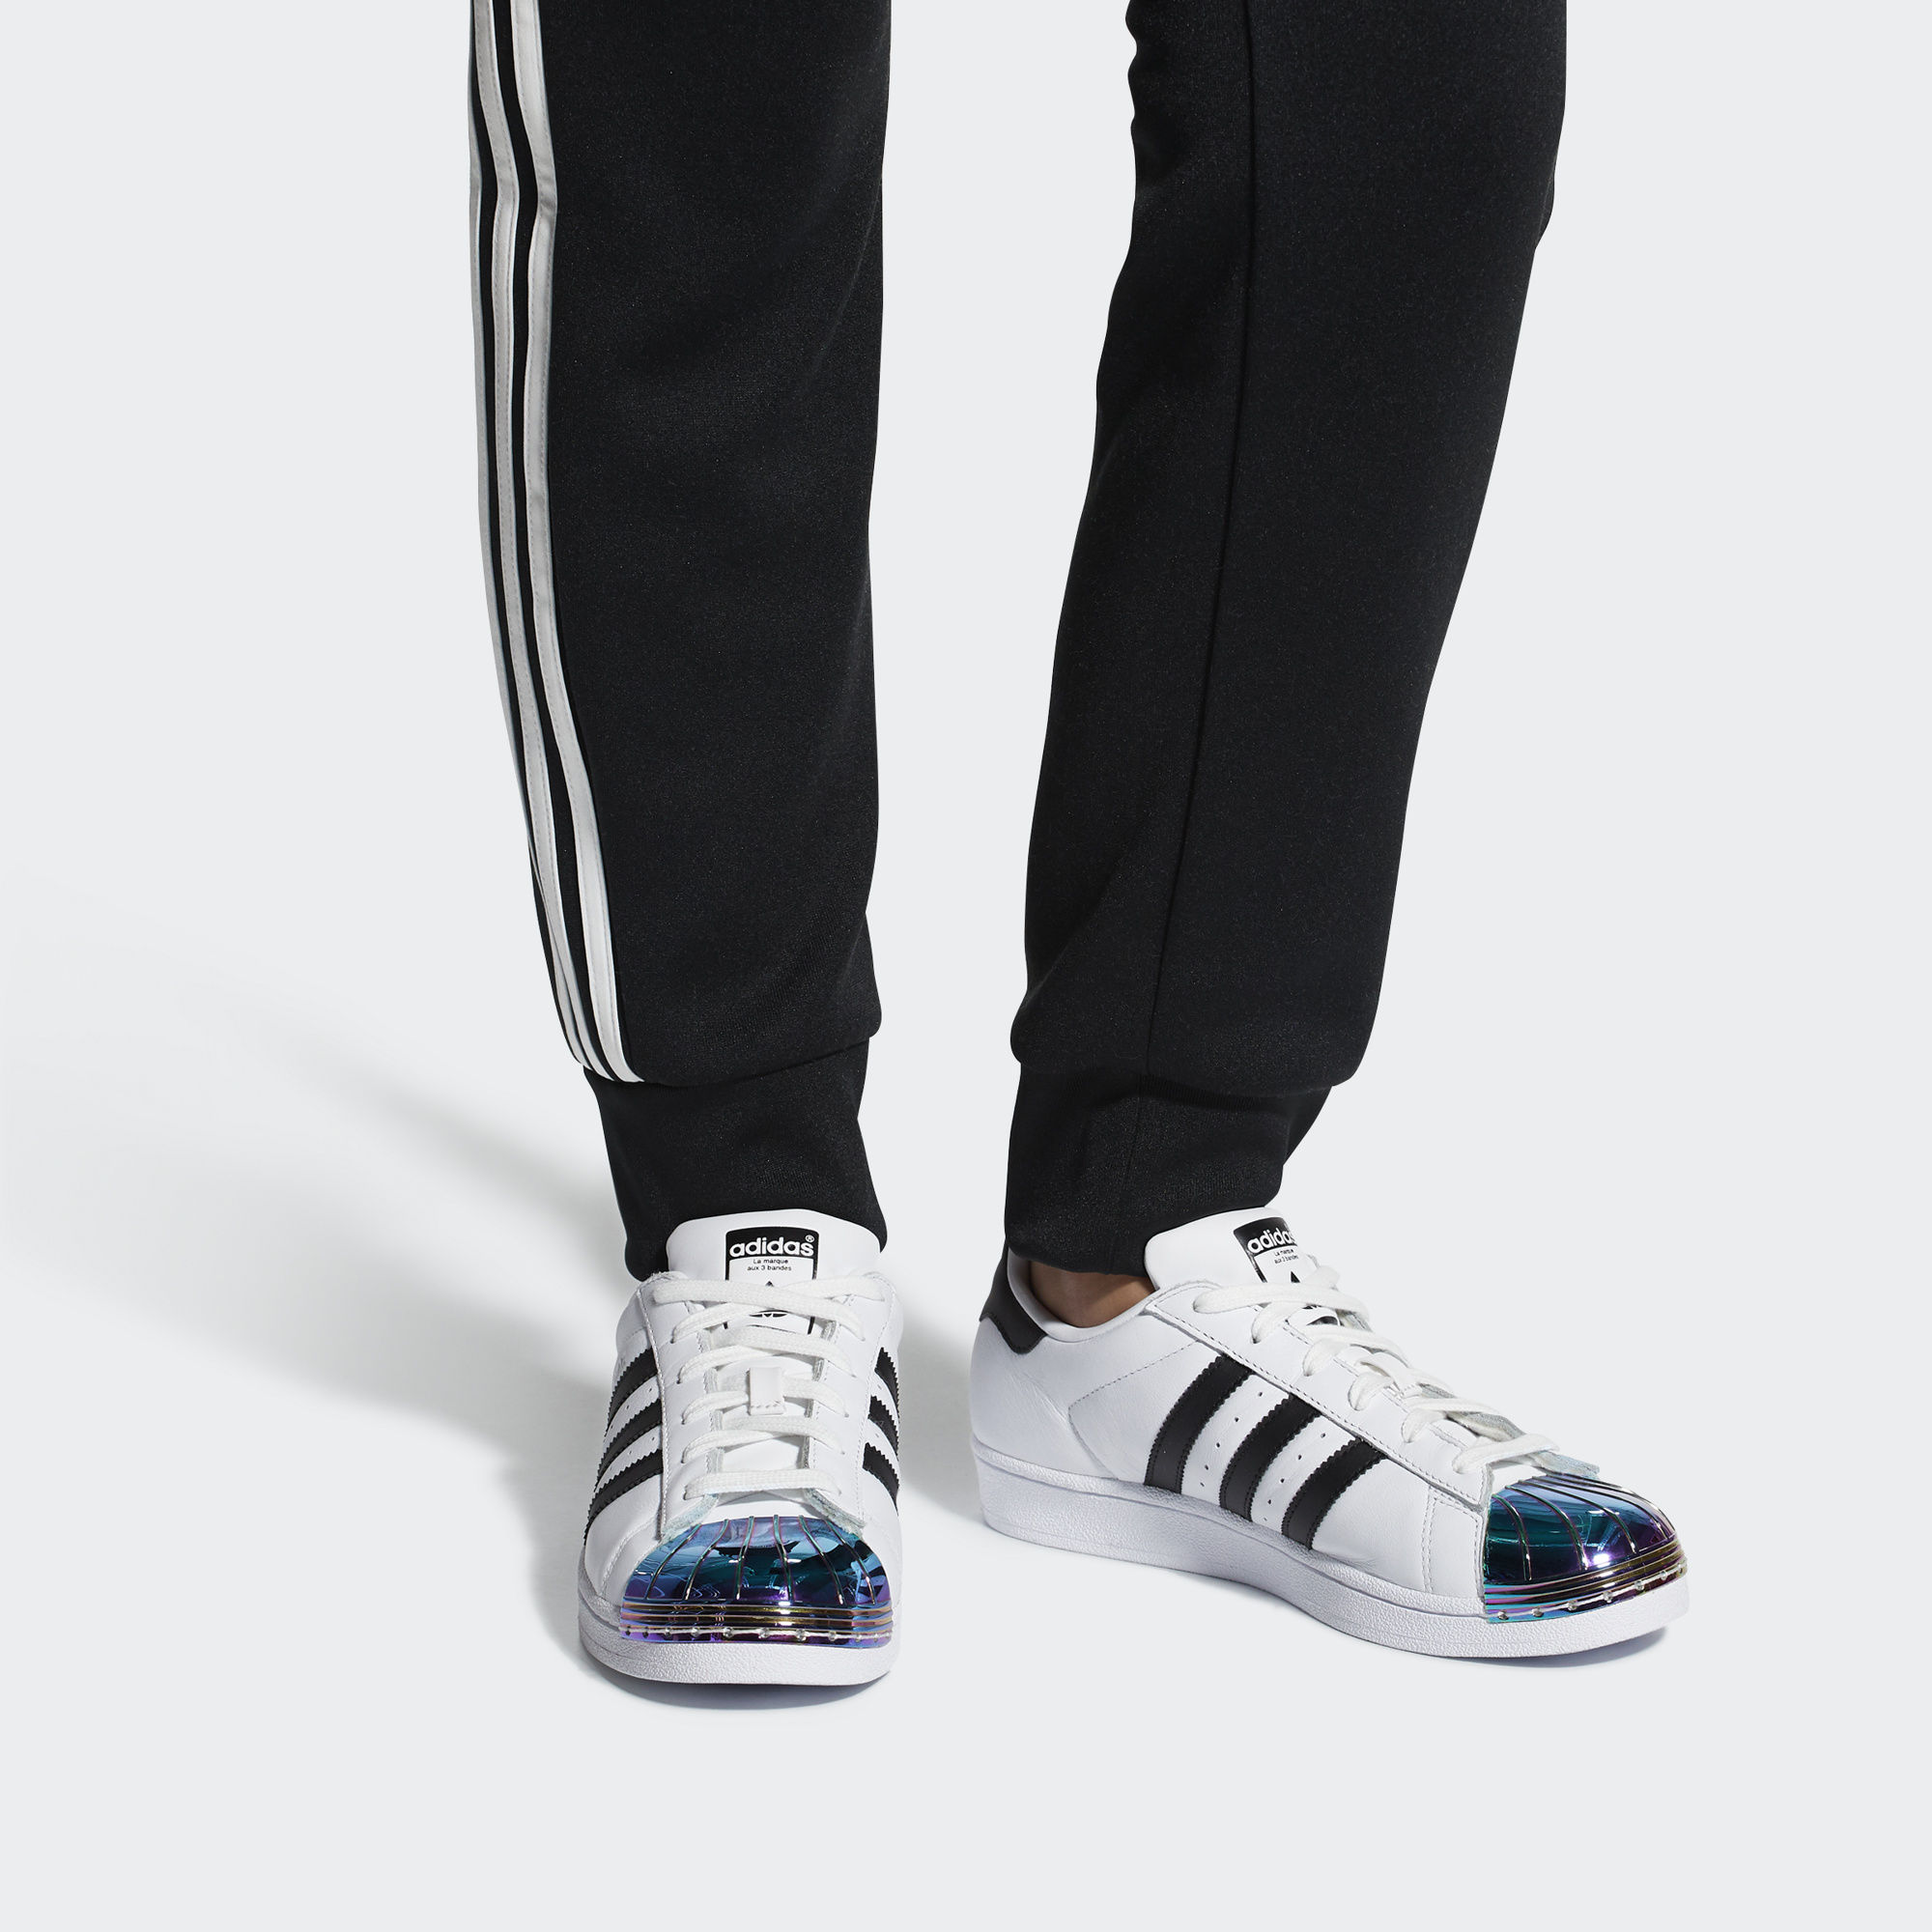 adidas superstar cq2610